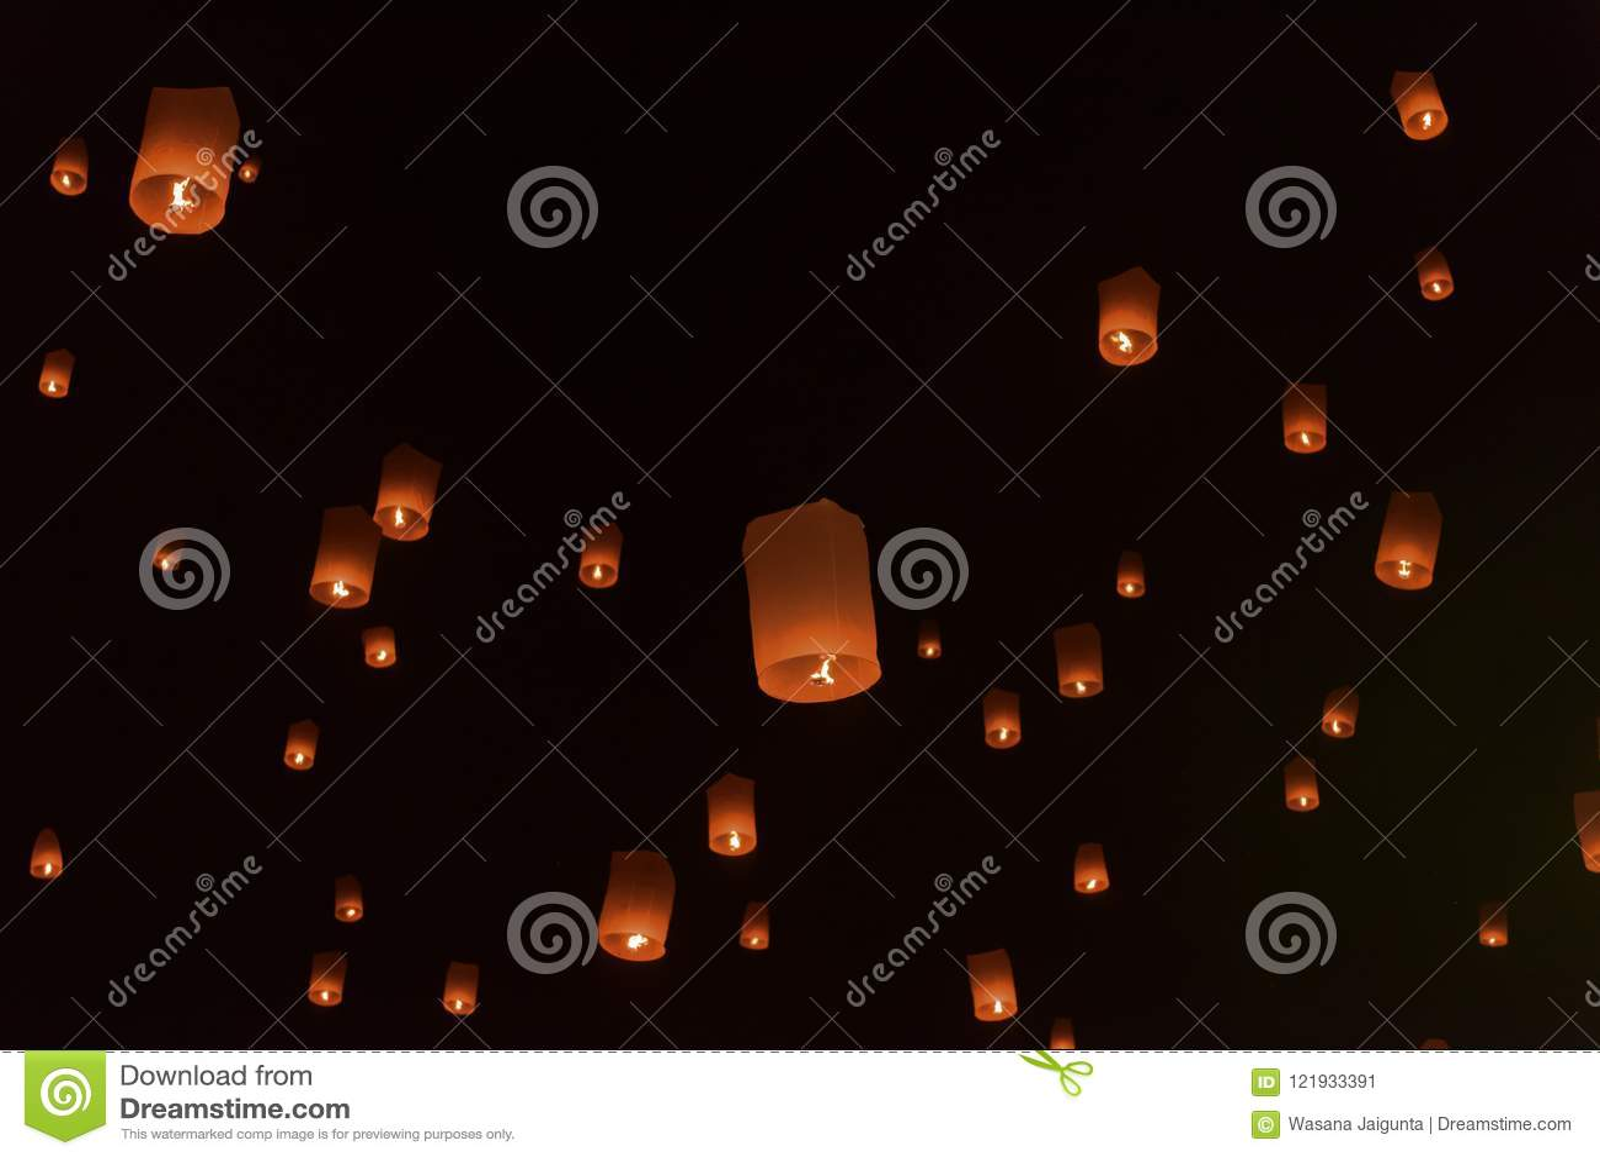 Floating Lanterns Or Balloon On The Sky Background Stock Image Image Of Light Arts 121933391